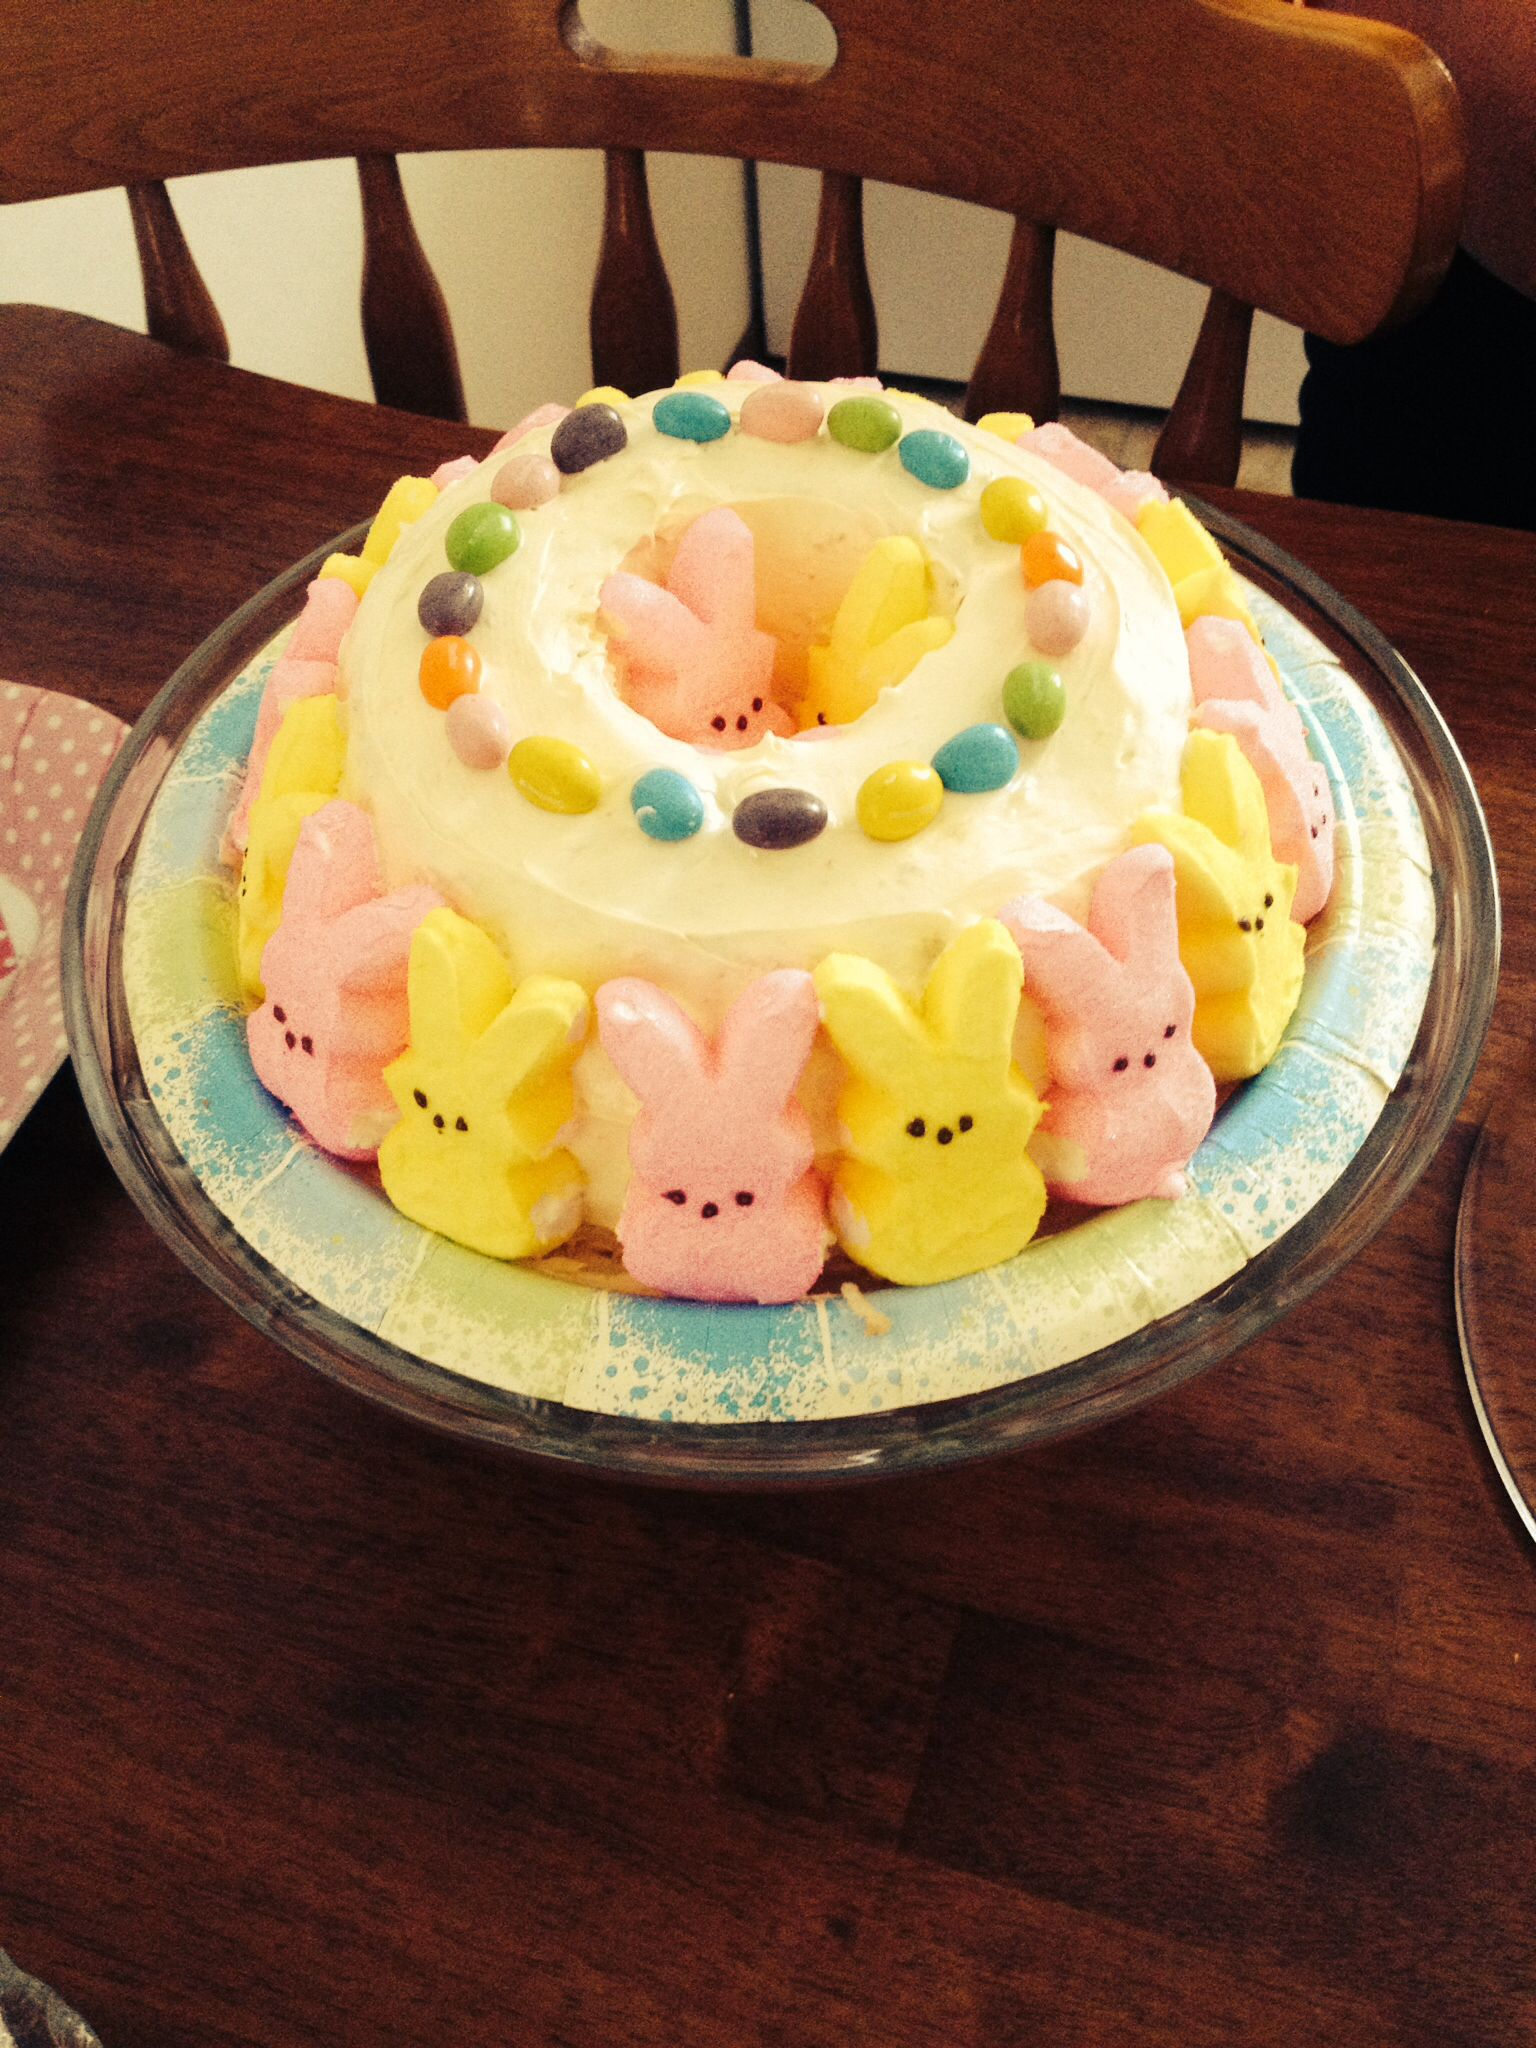 My Moms Easter Cake Buy One Angel Good Cake Buy Whipped Butter